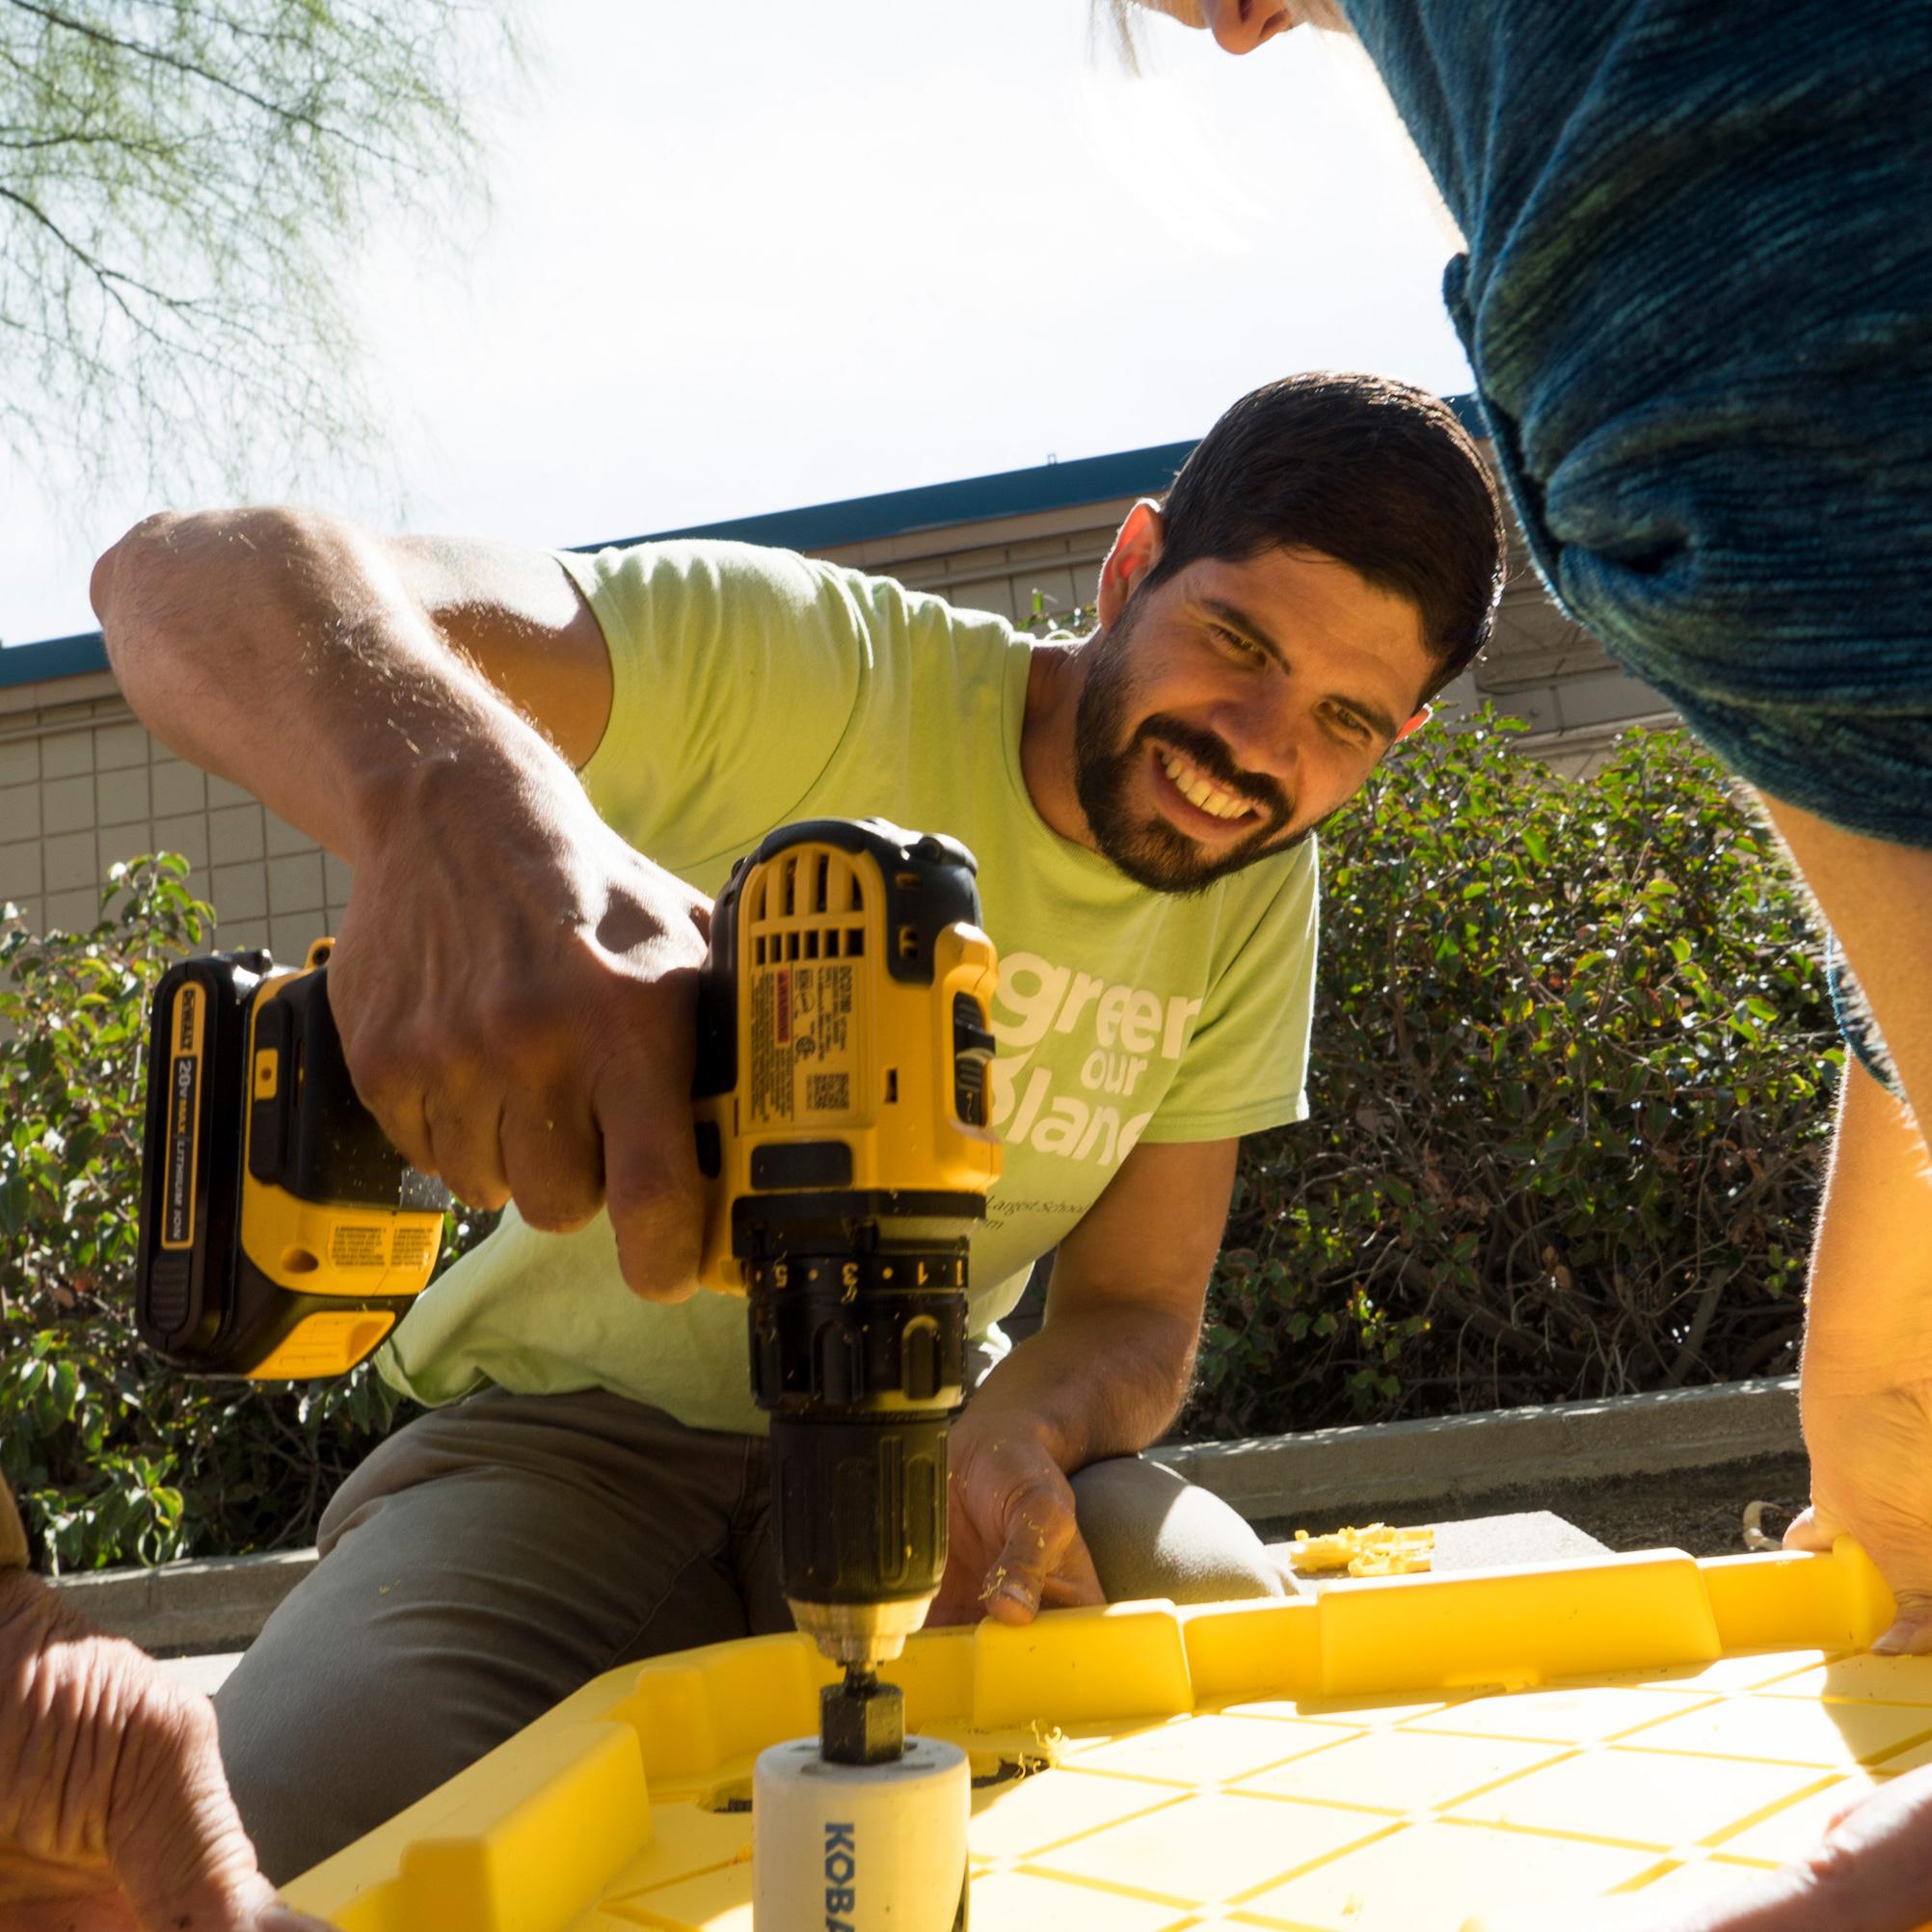 building a school garden